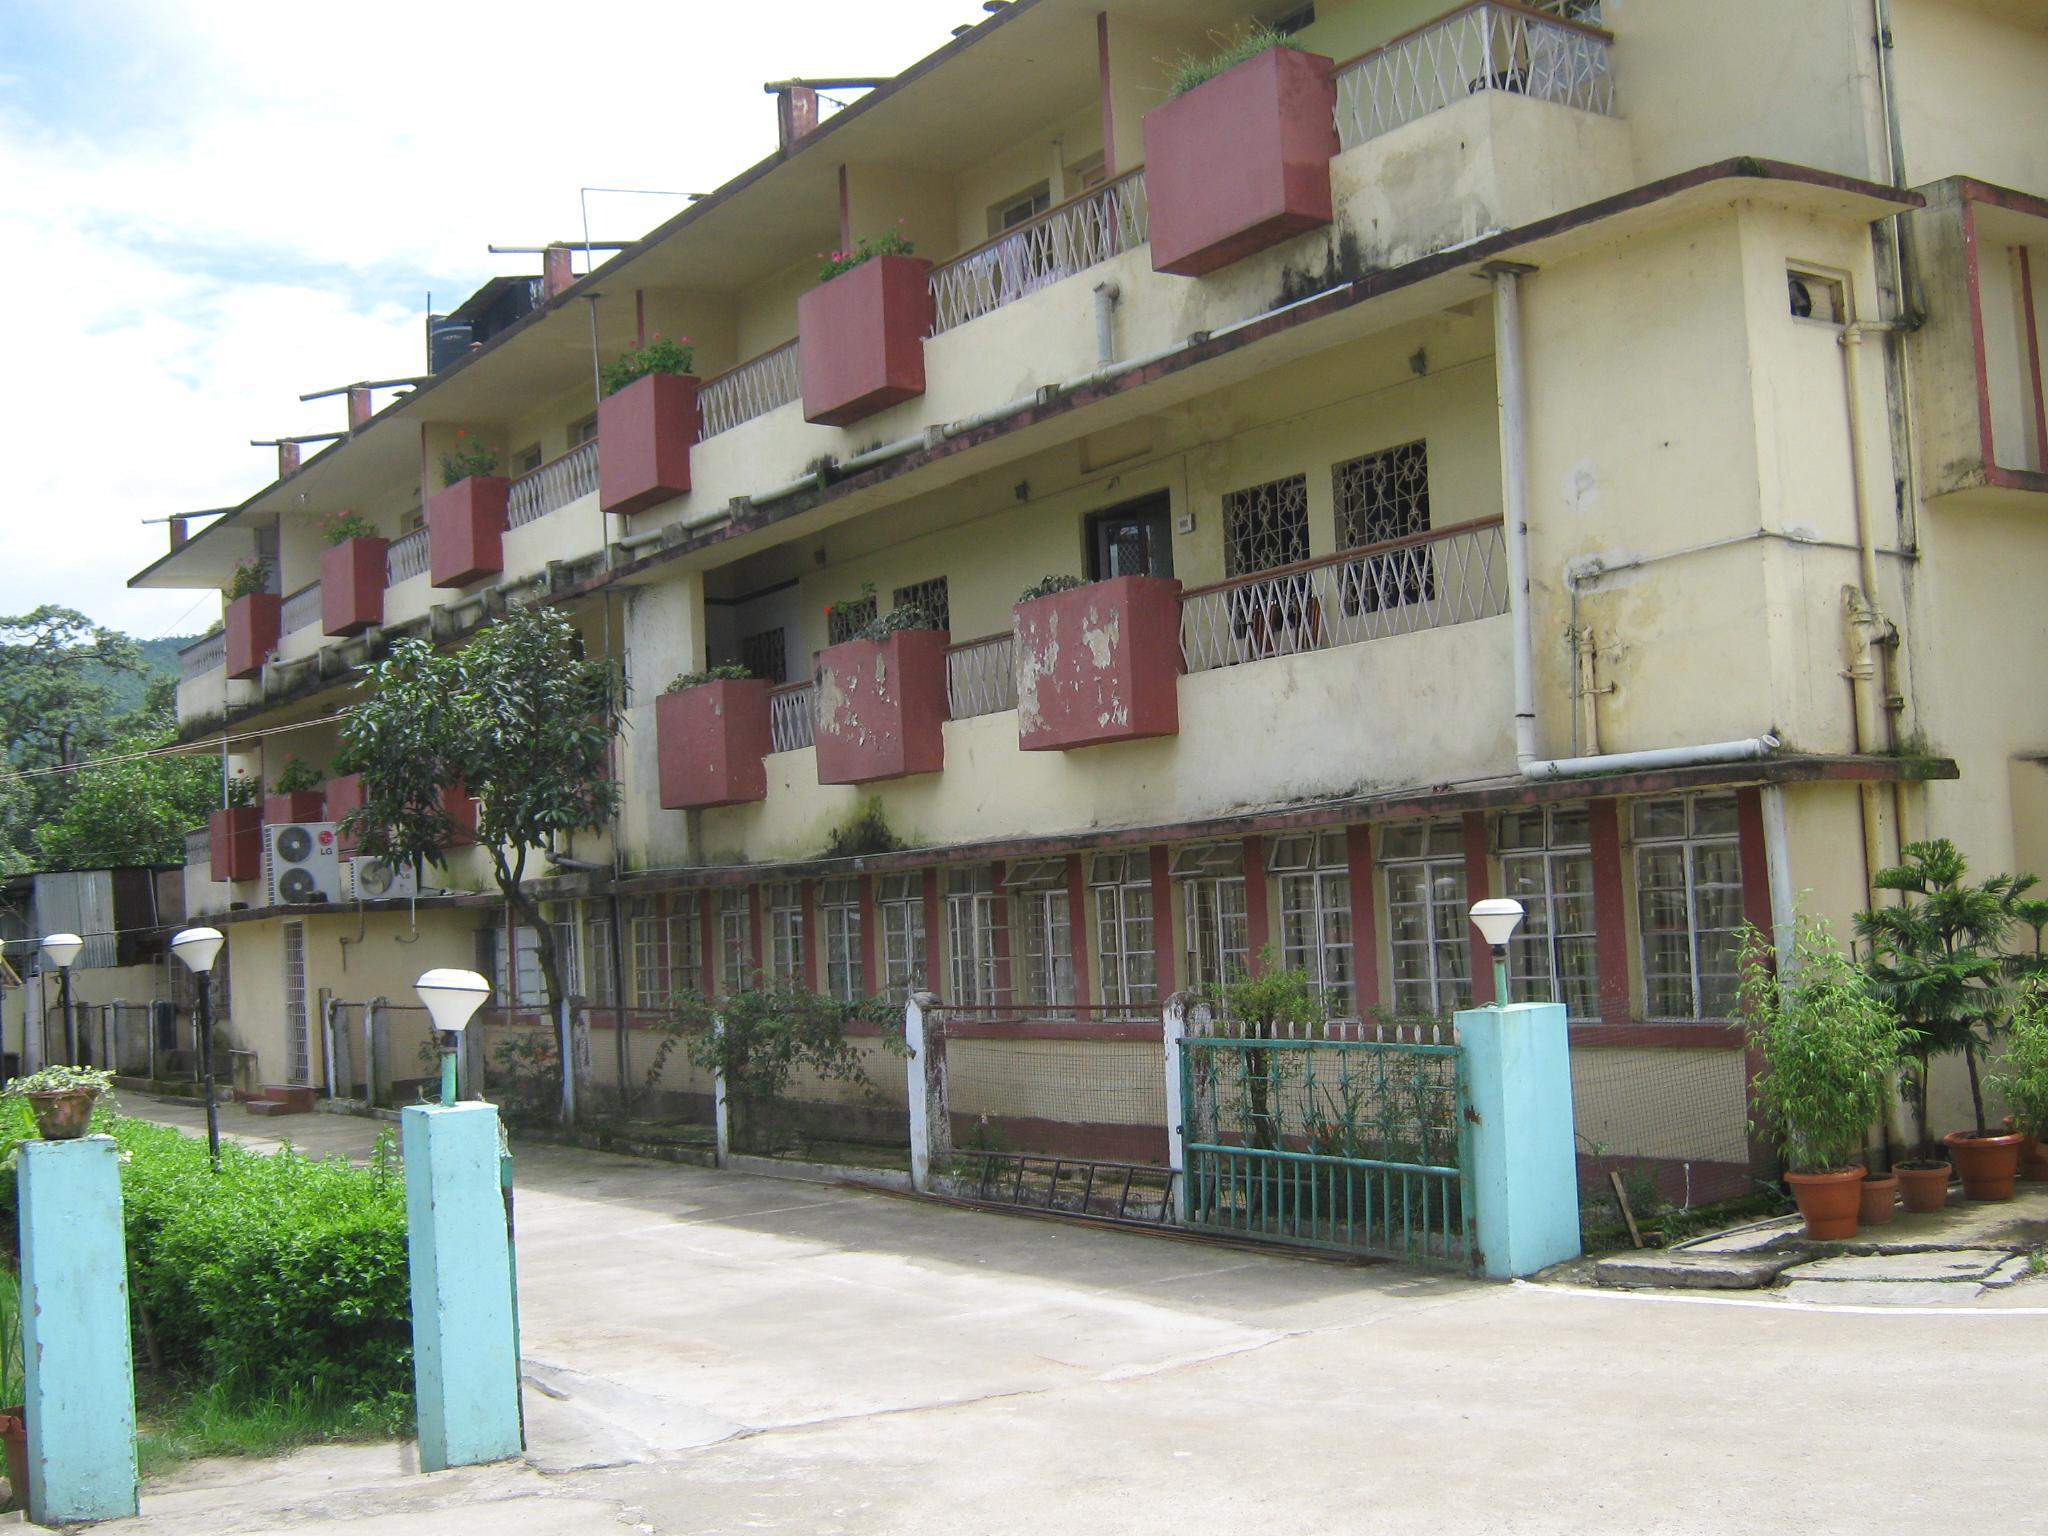 The Shillong Club